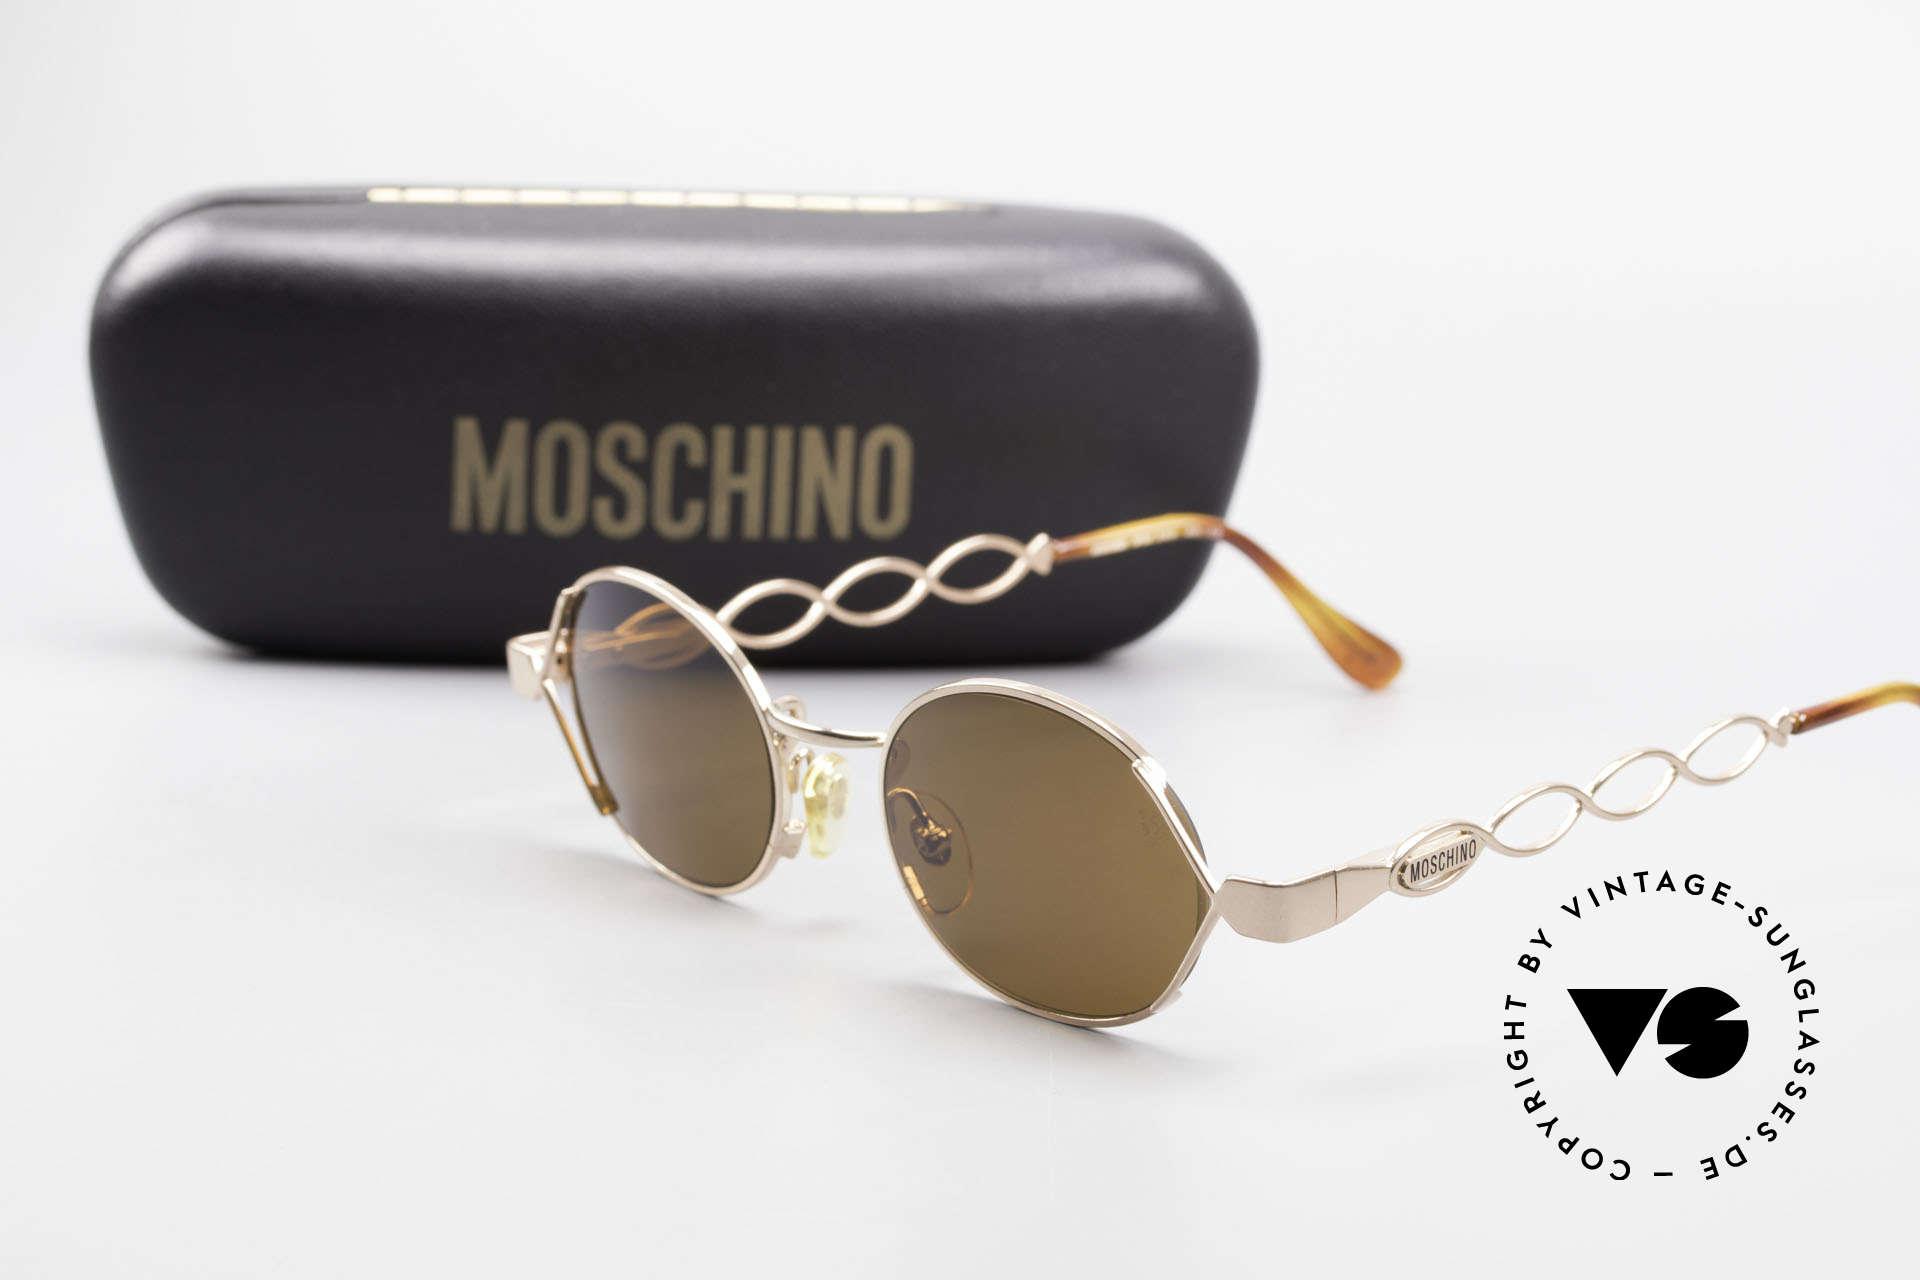 Moschino MM344 Ladies Designer Sunglasses 90s, Size: medium, Made for Women